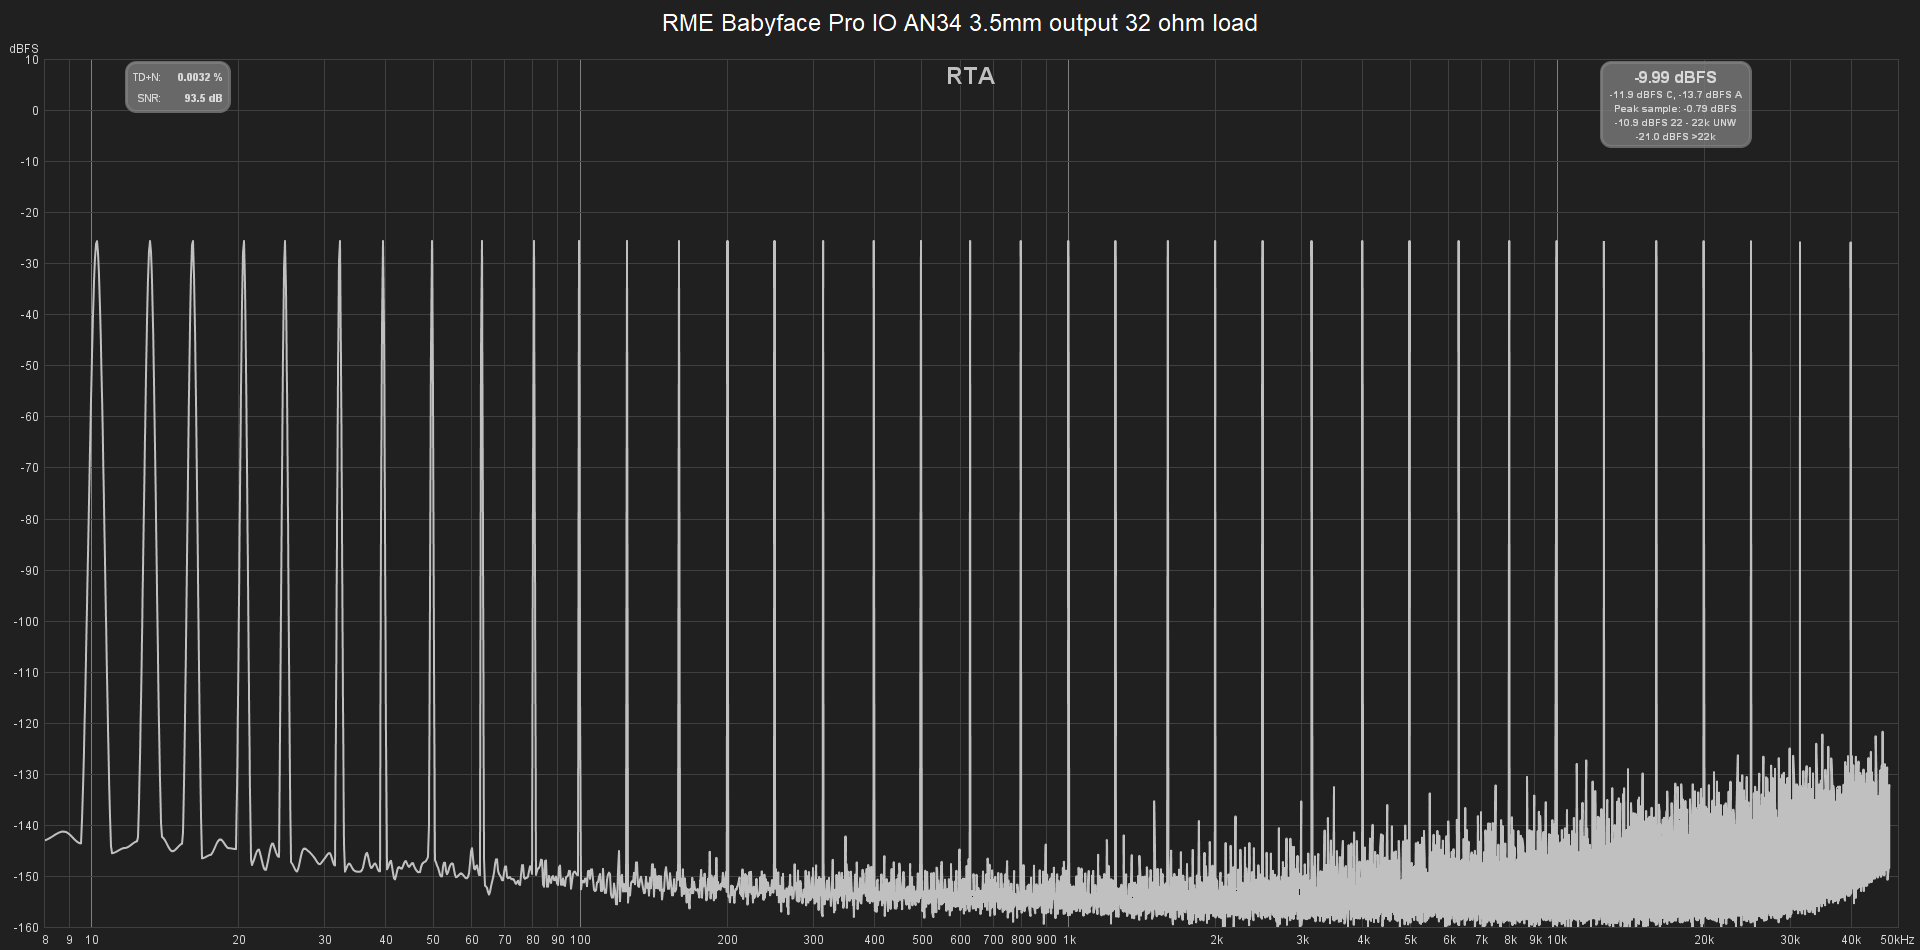 RME Babyface Pro AN34 3.5mm 32ohm 10-40kHz Multitone.png